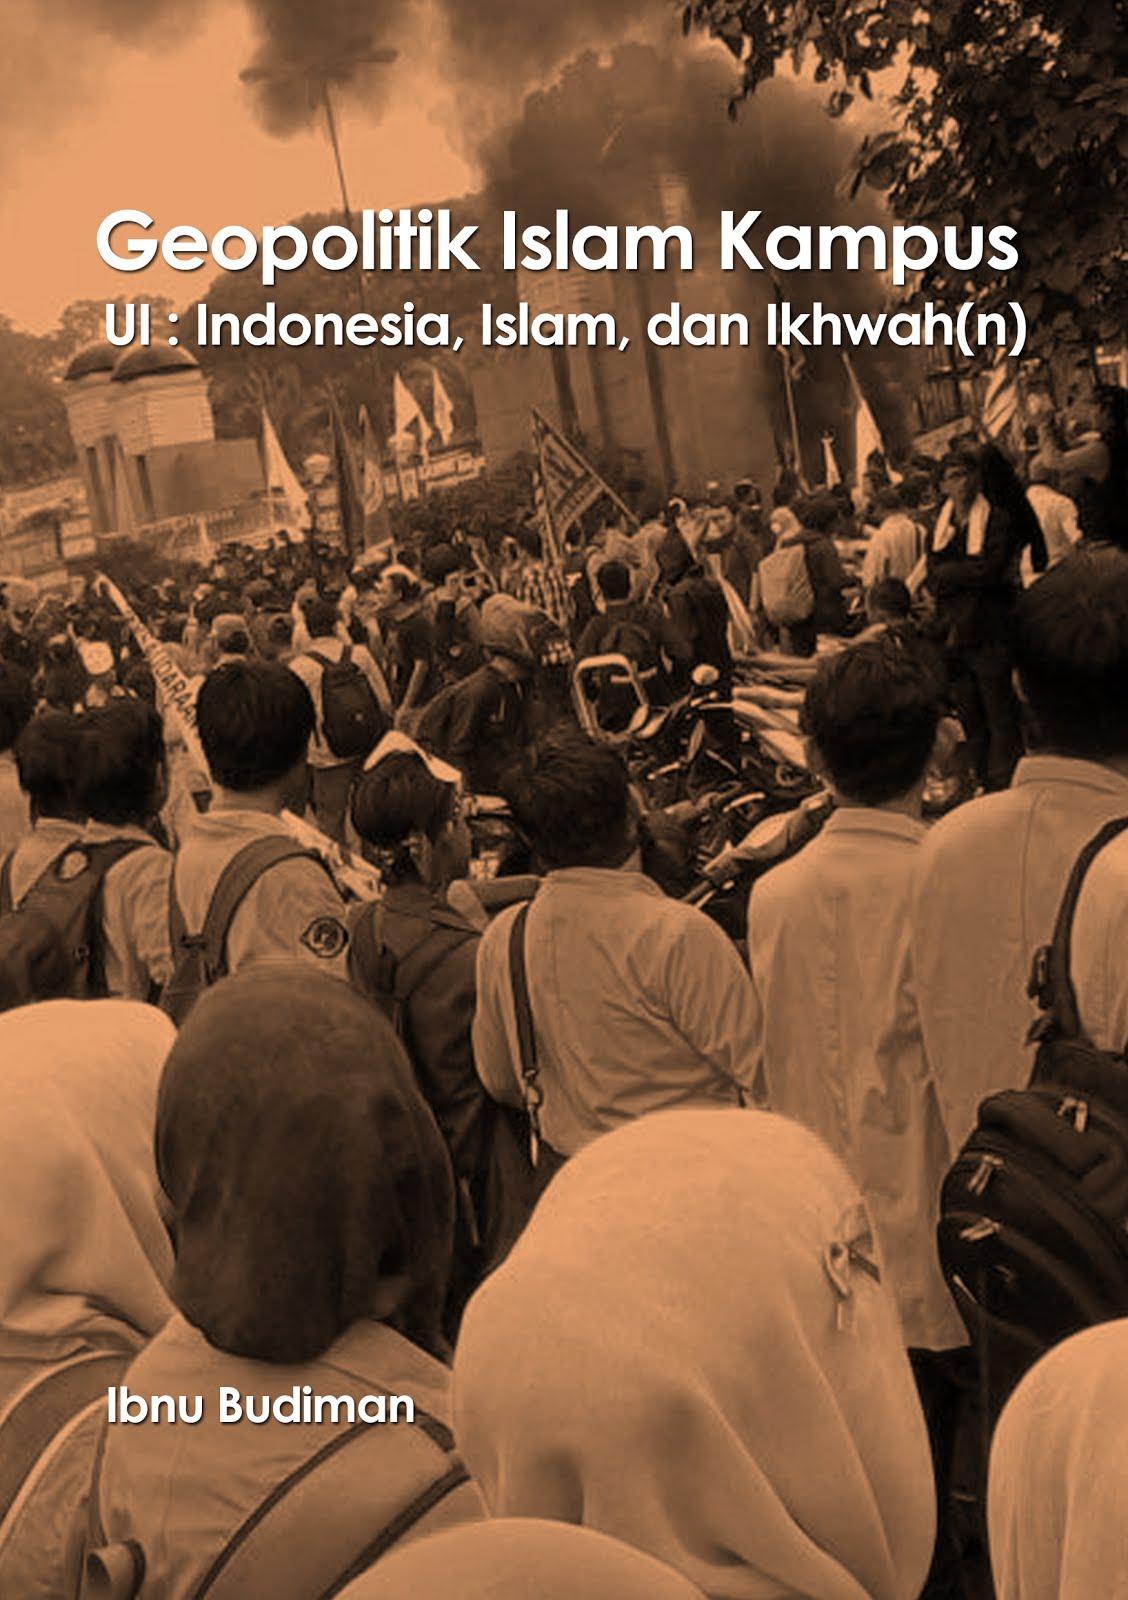 Geopolitik Islam Kampus UI